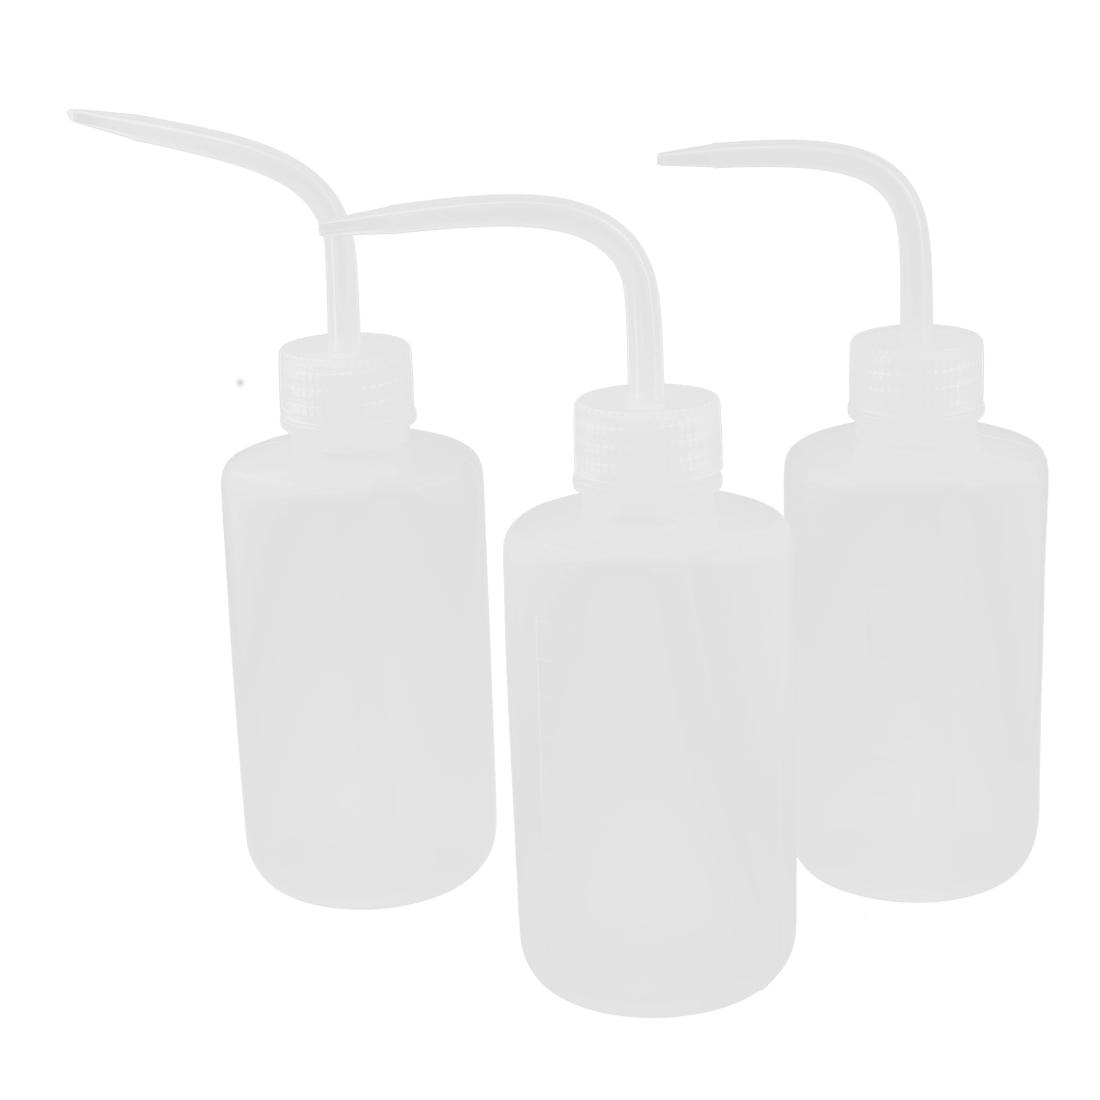 Clear Plastic Bent Tip Oil Liquid Squeeze Bottle Dispenser 250ml 3pcs